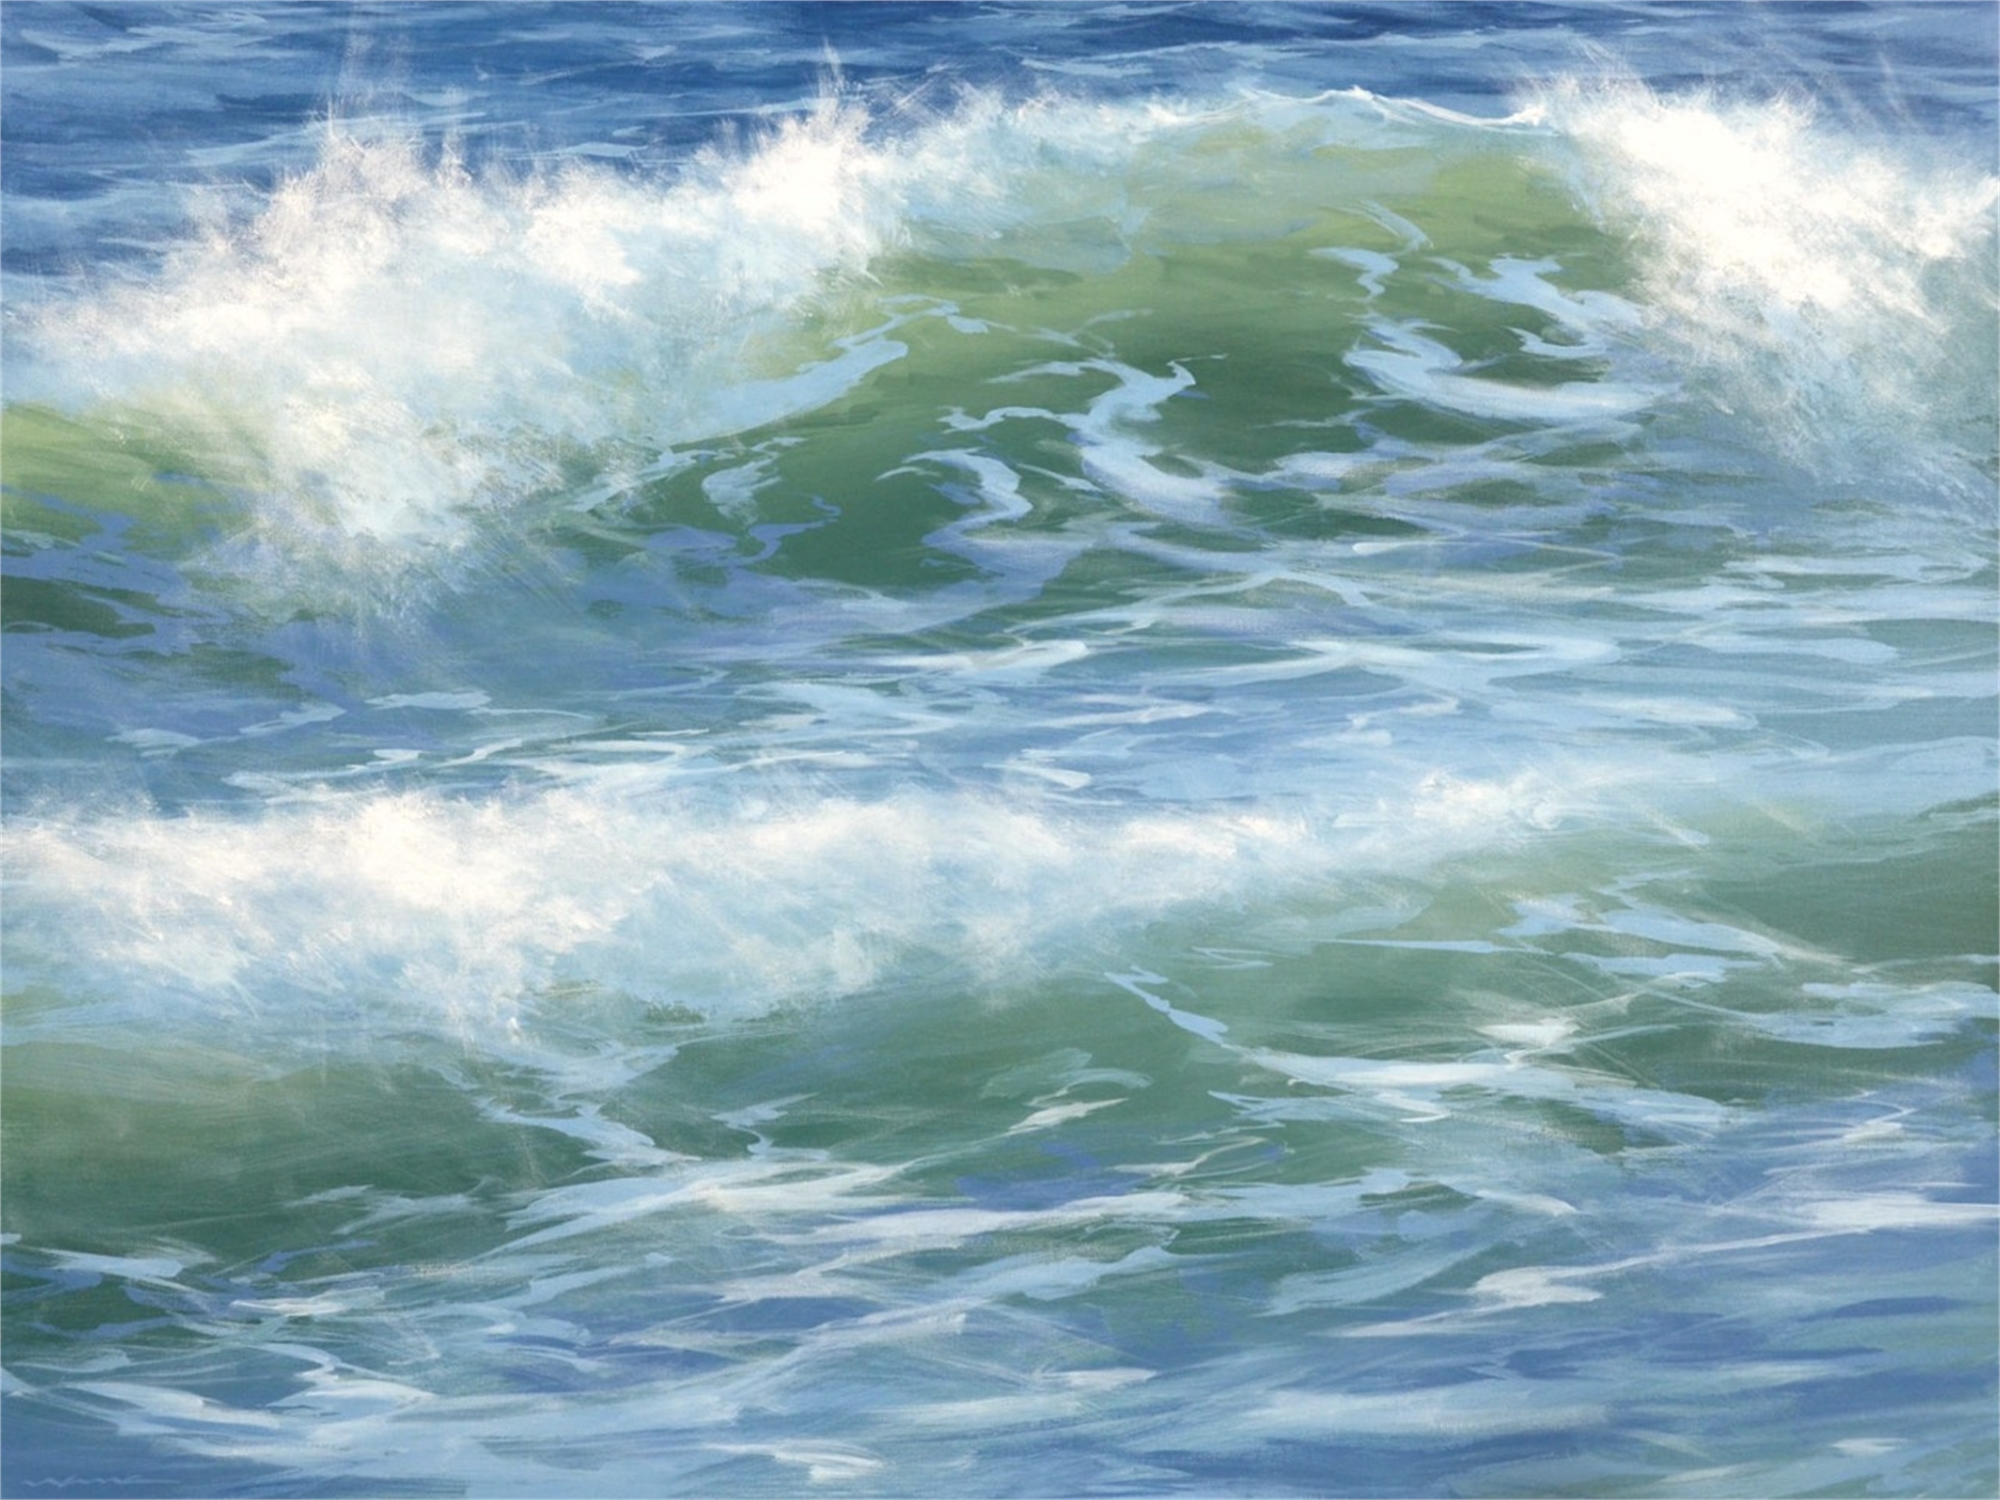 Blue Rush by David Nance